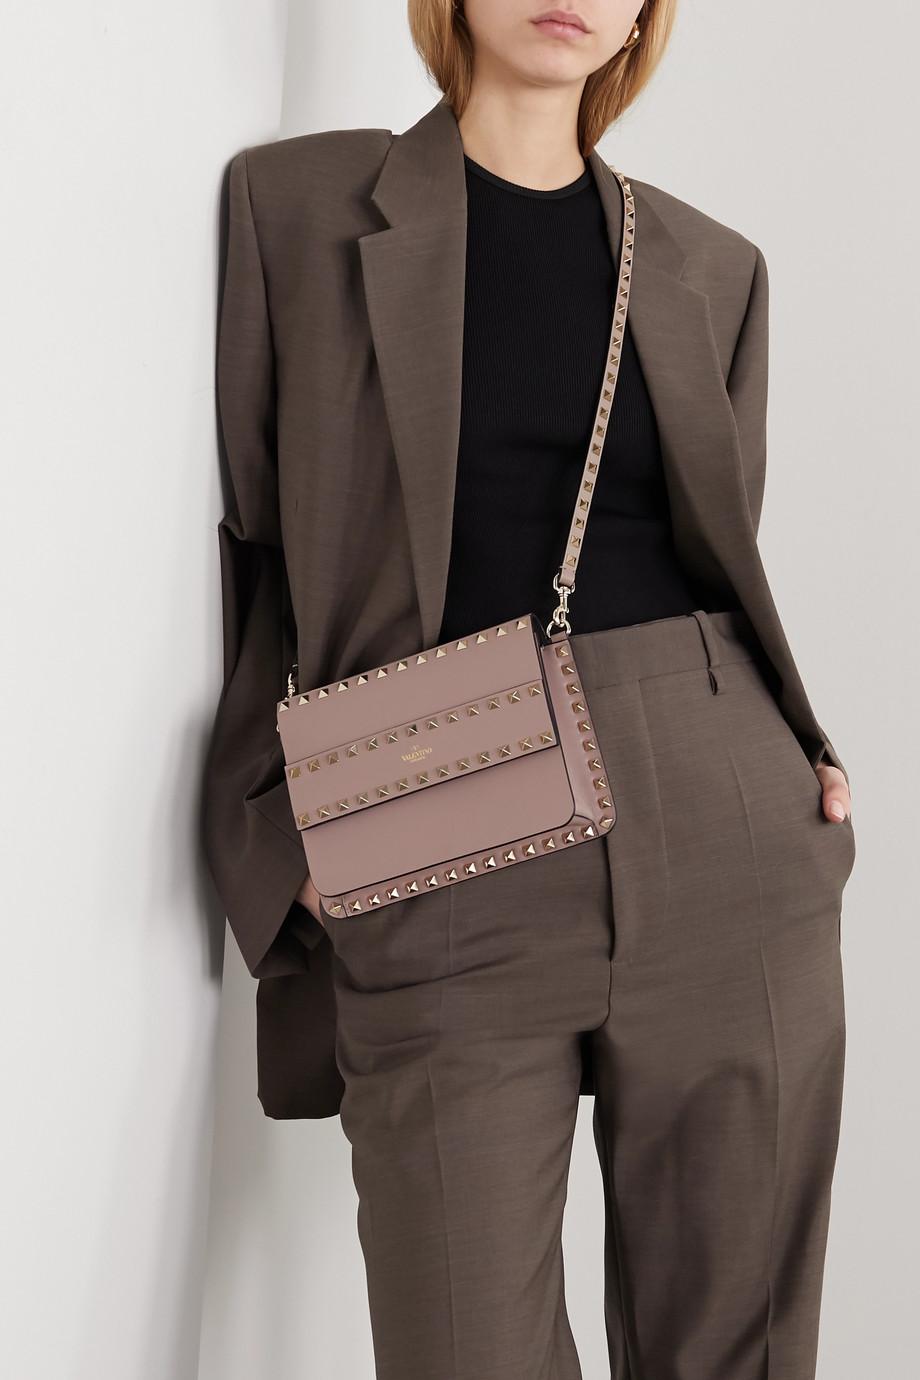 Valentino Valentino Garavani Rockstud leather shoulder bag